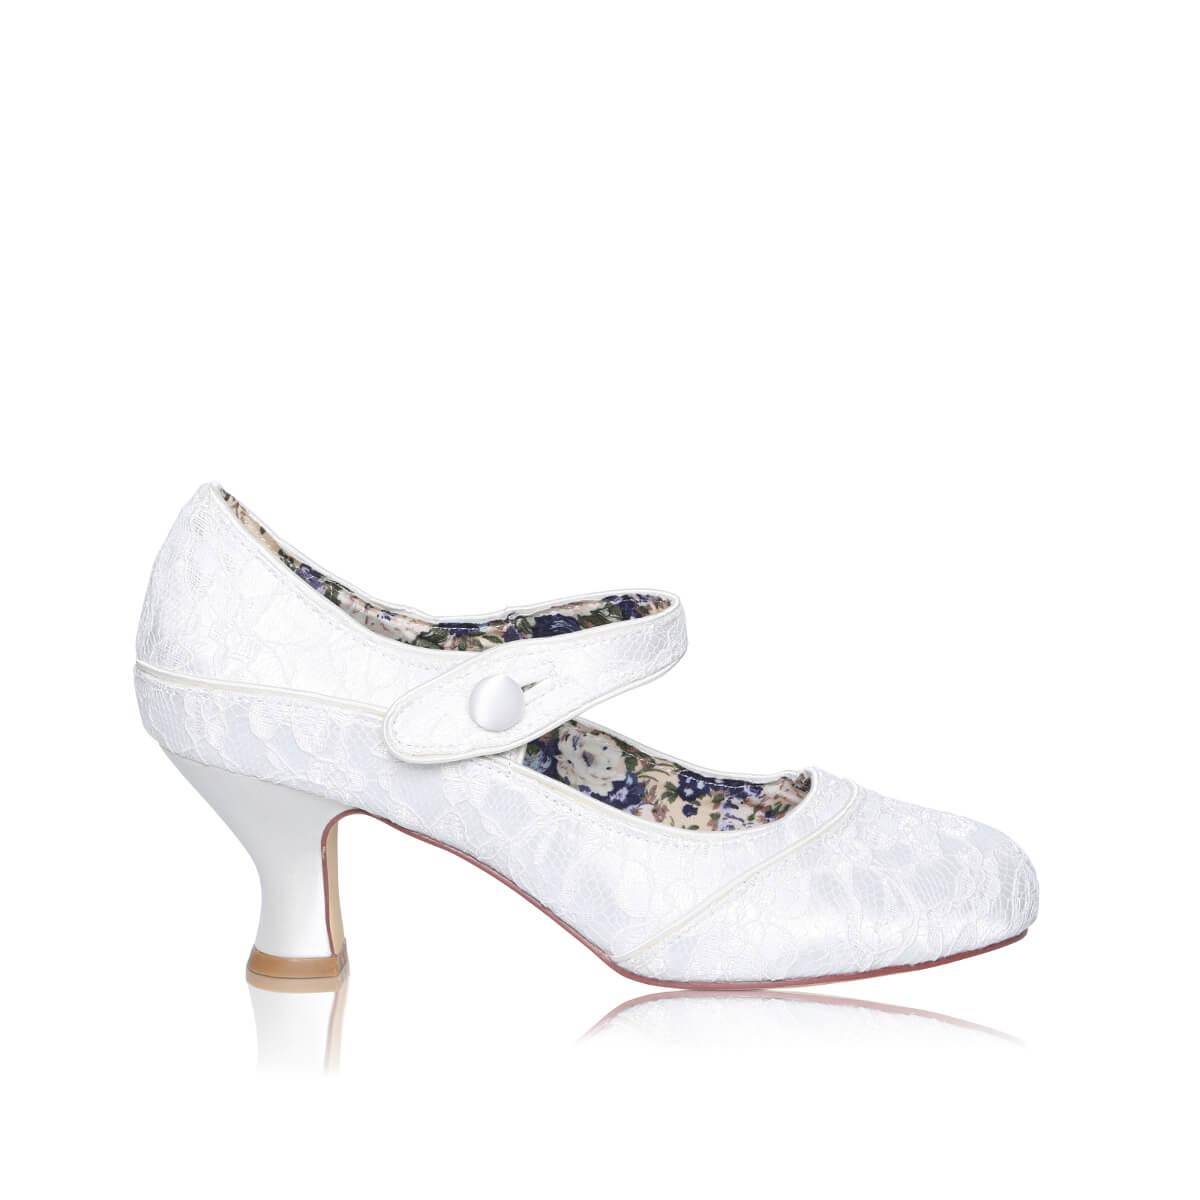 esta - wide fit Wedding Shoes - The